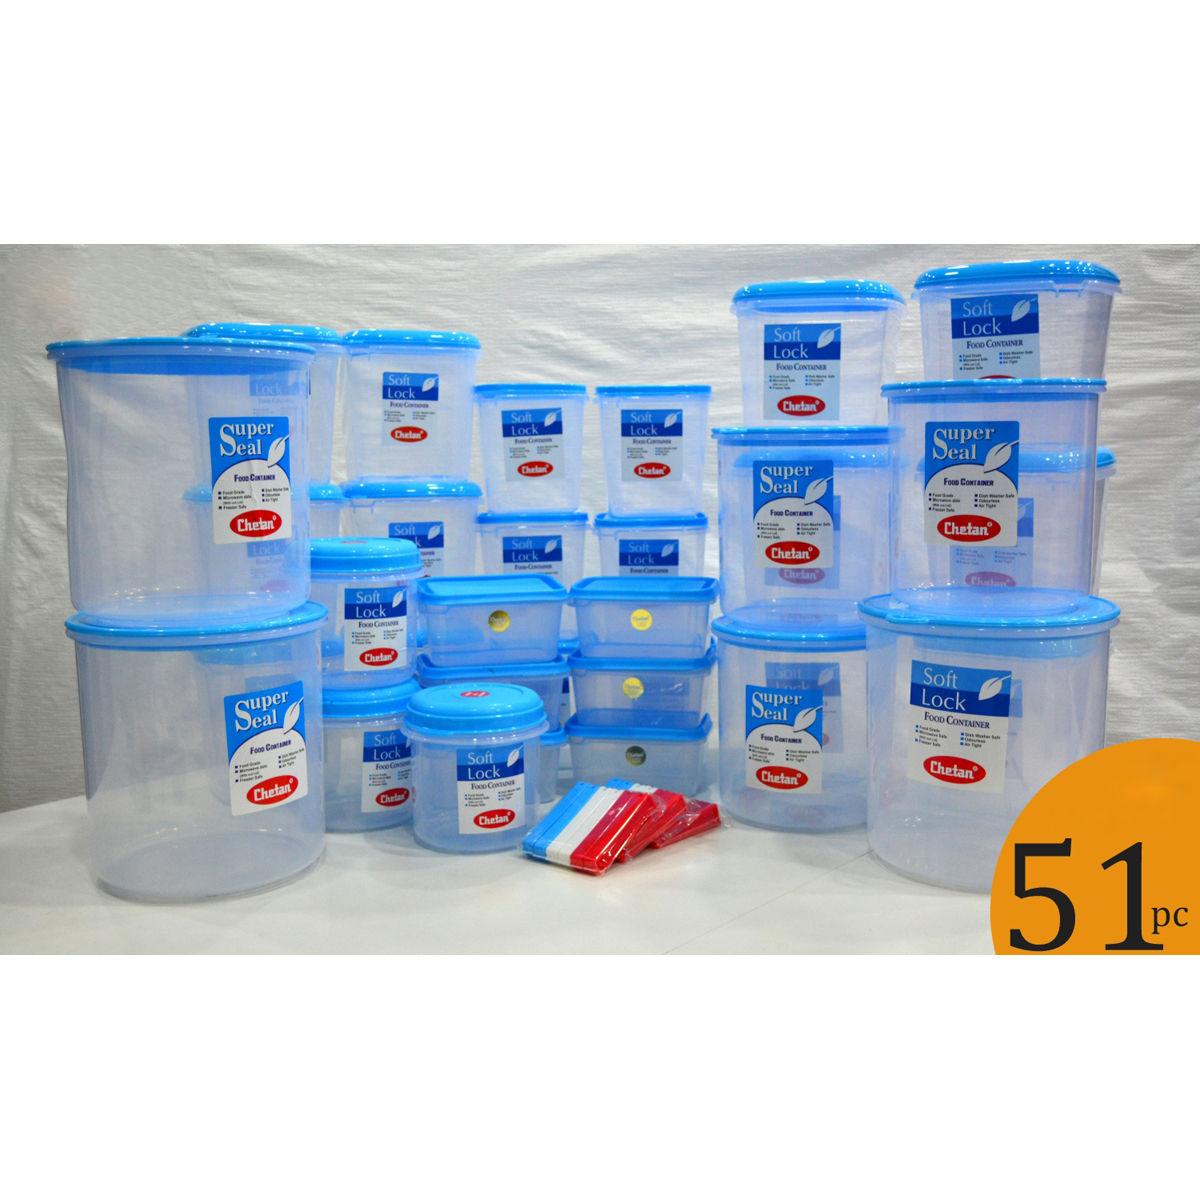 kitchen storage boxes base cabinet depth buy chetan set of 51 pcs plastic airtight